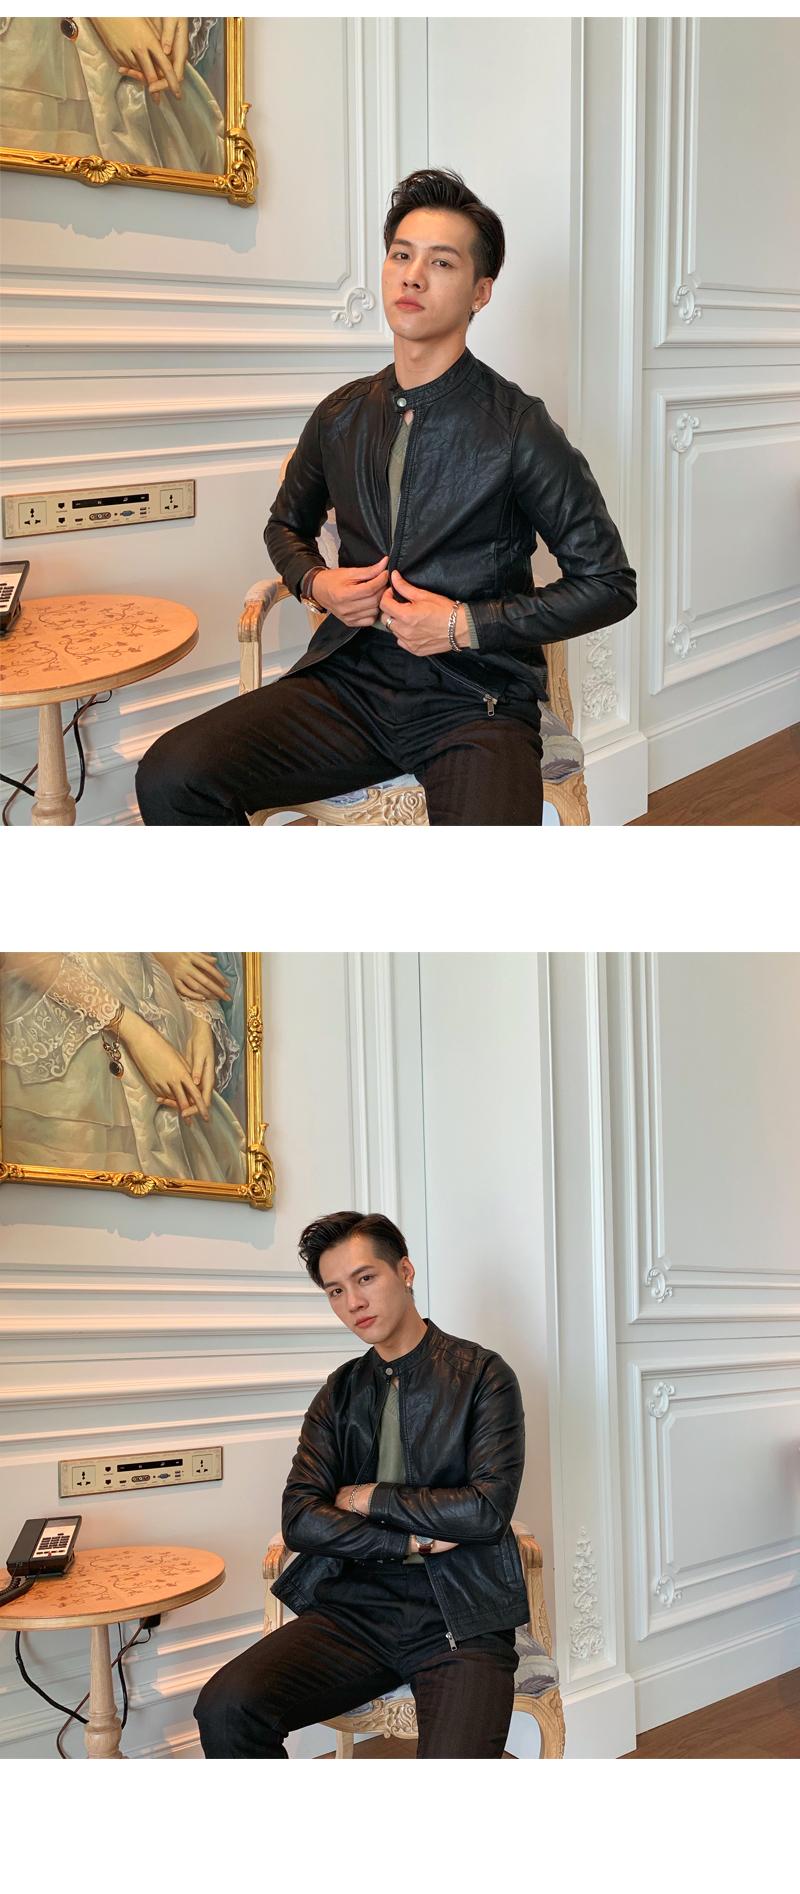 South Korea Korean version handsome collar leather jacket men's retro personality PU leather clothing fashion 100 locomotive leather fashion tide 54 Online shopping Bangladesh